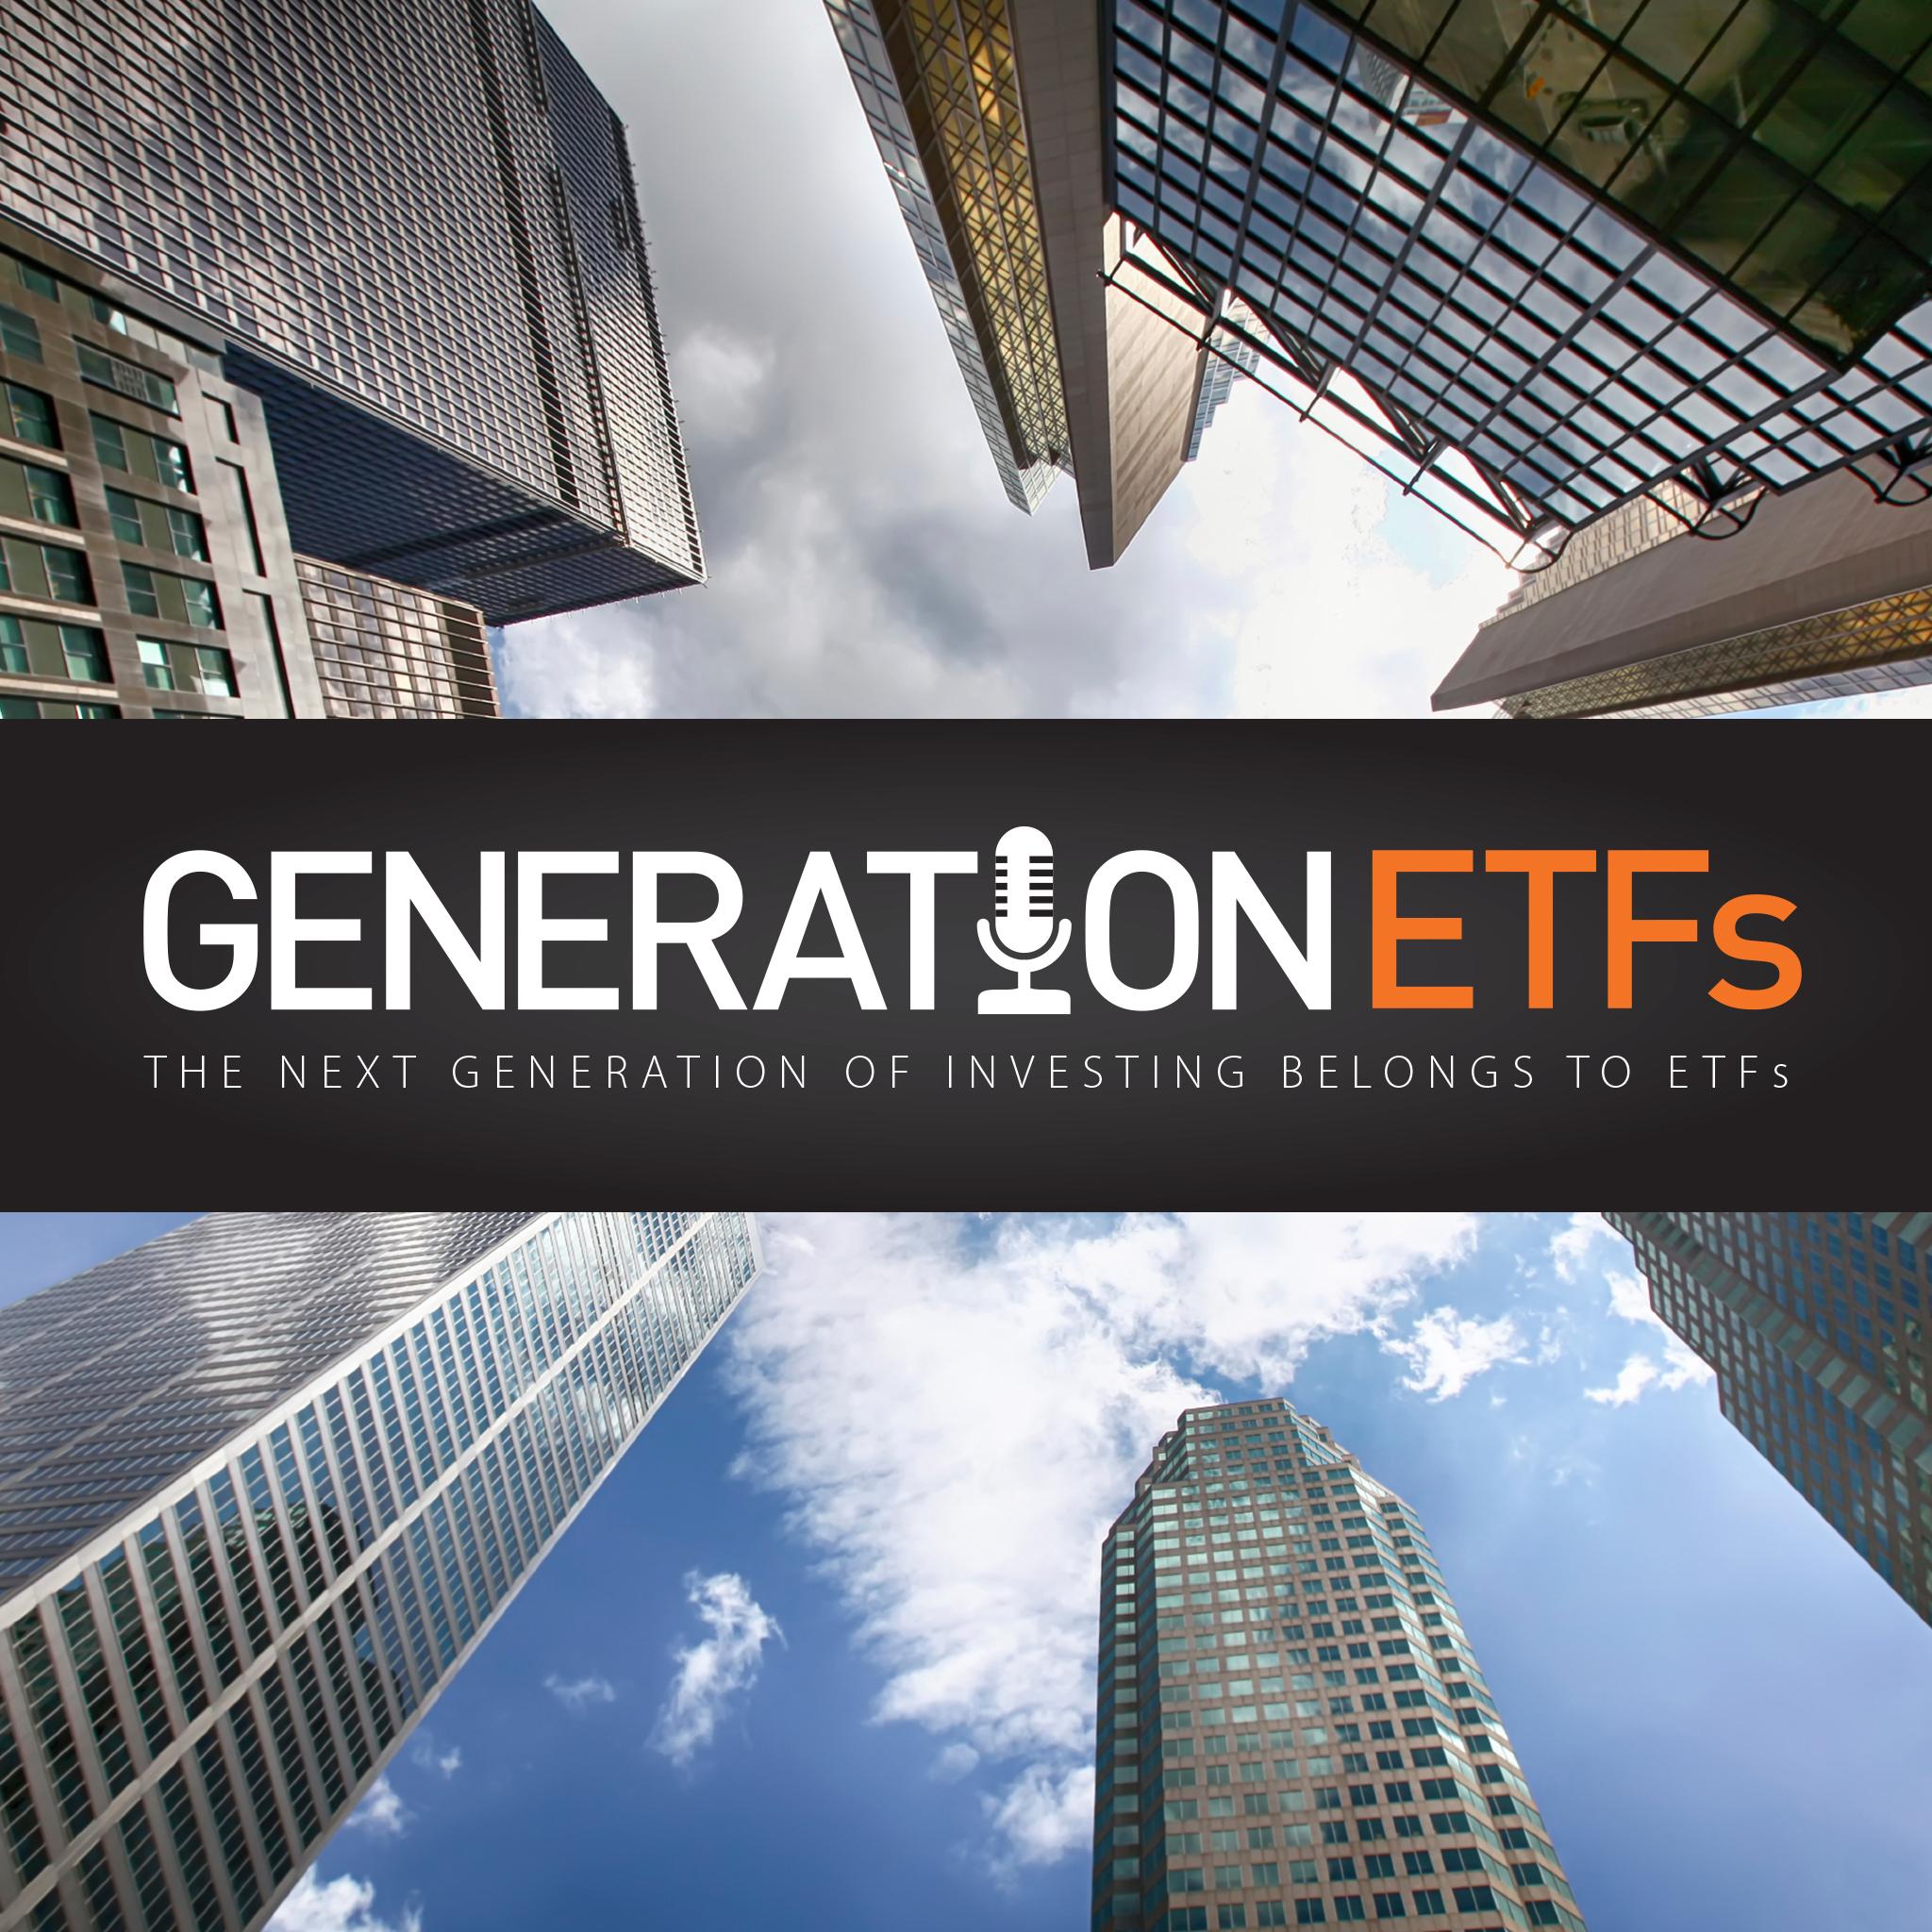 Generation ETFs show art